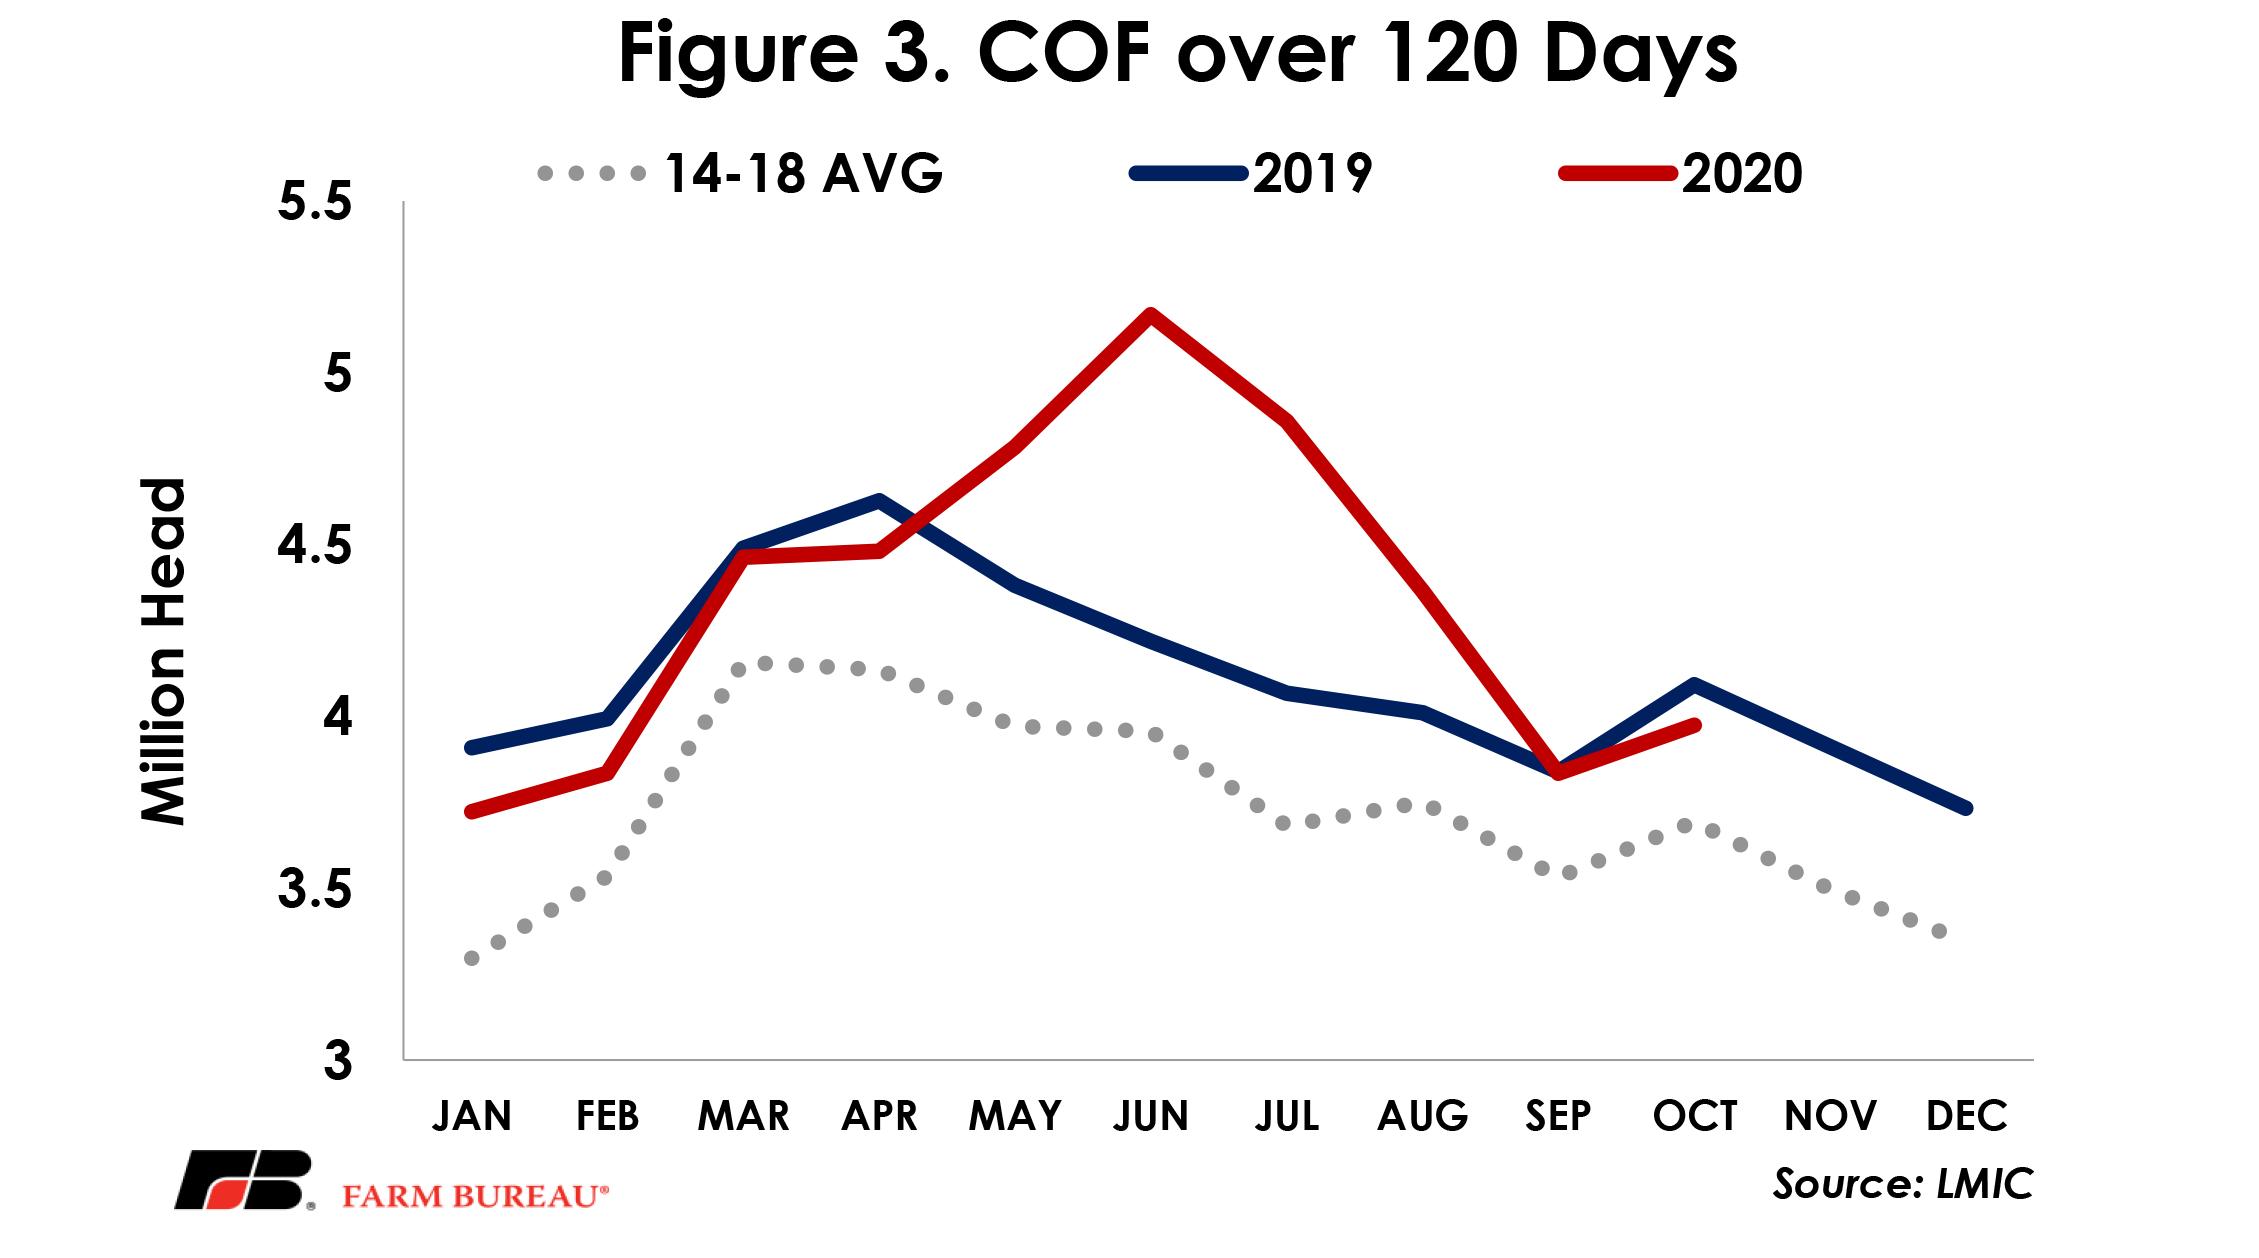 Figure 3 - COF over 120 Days